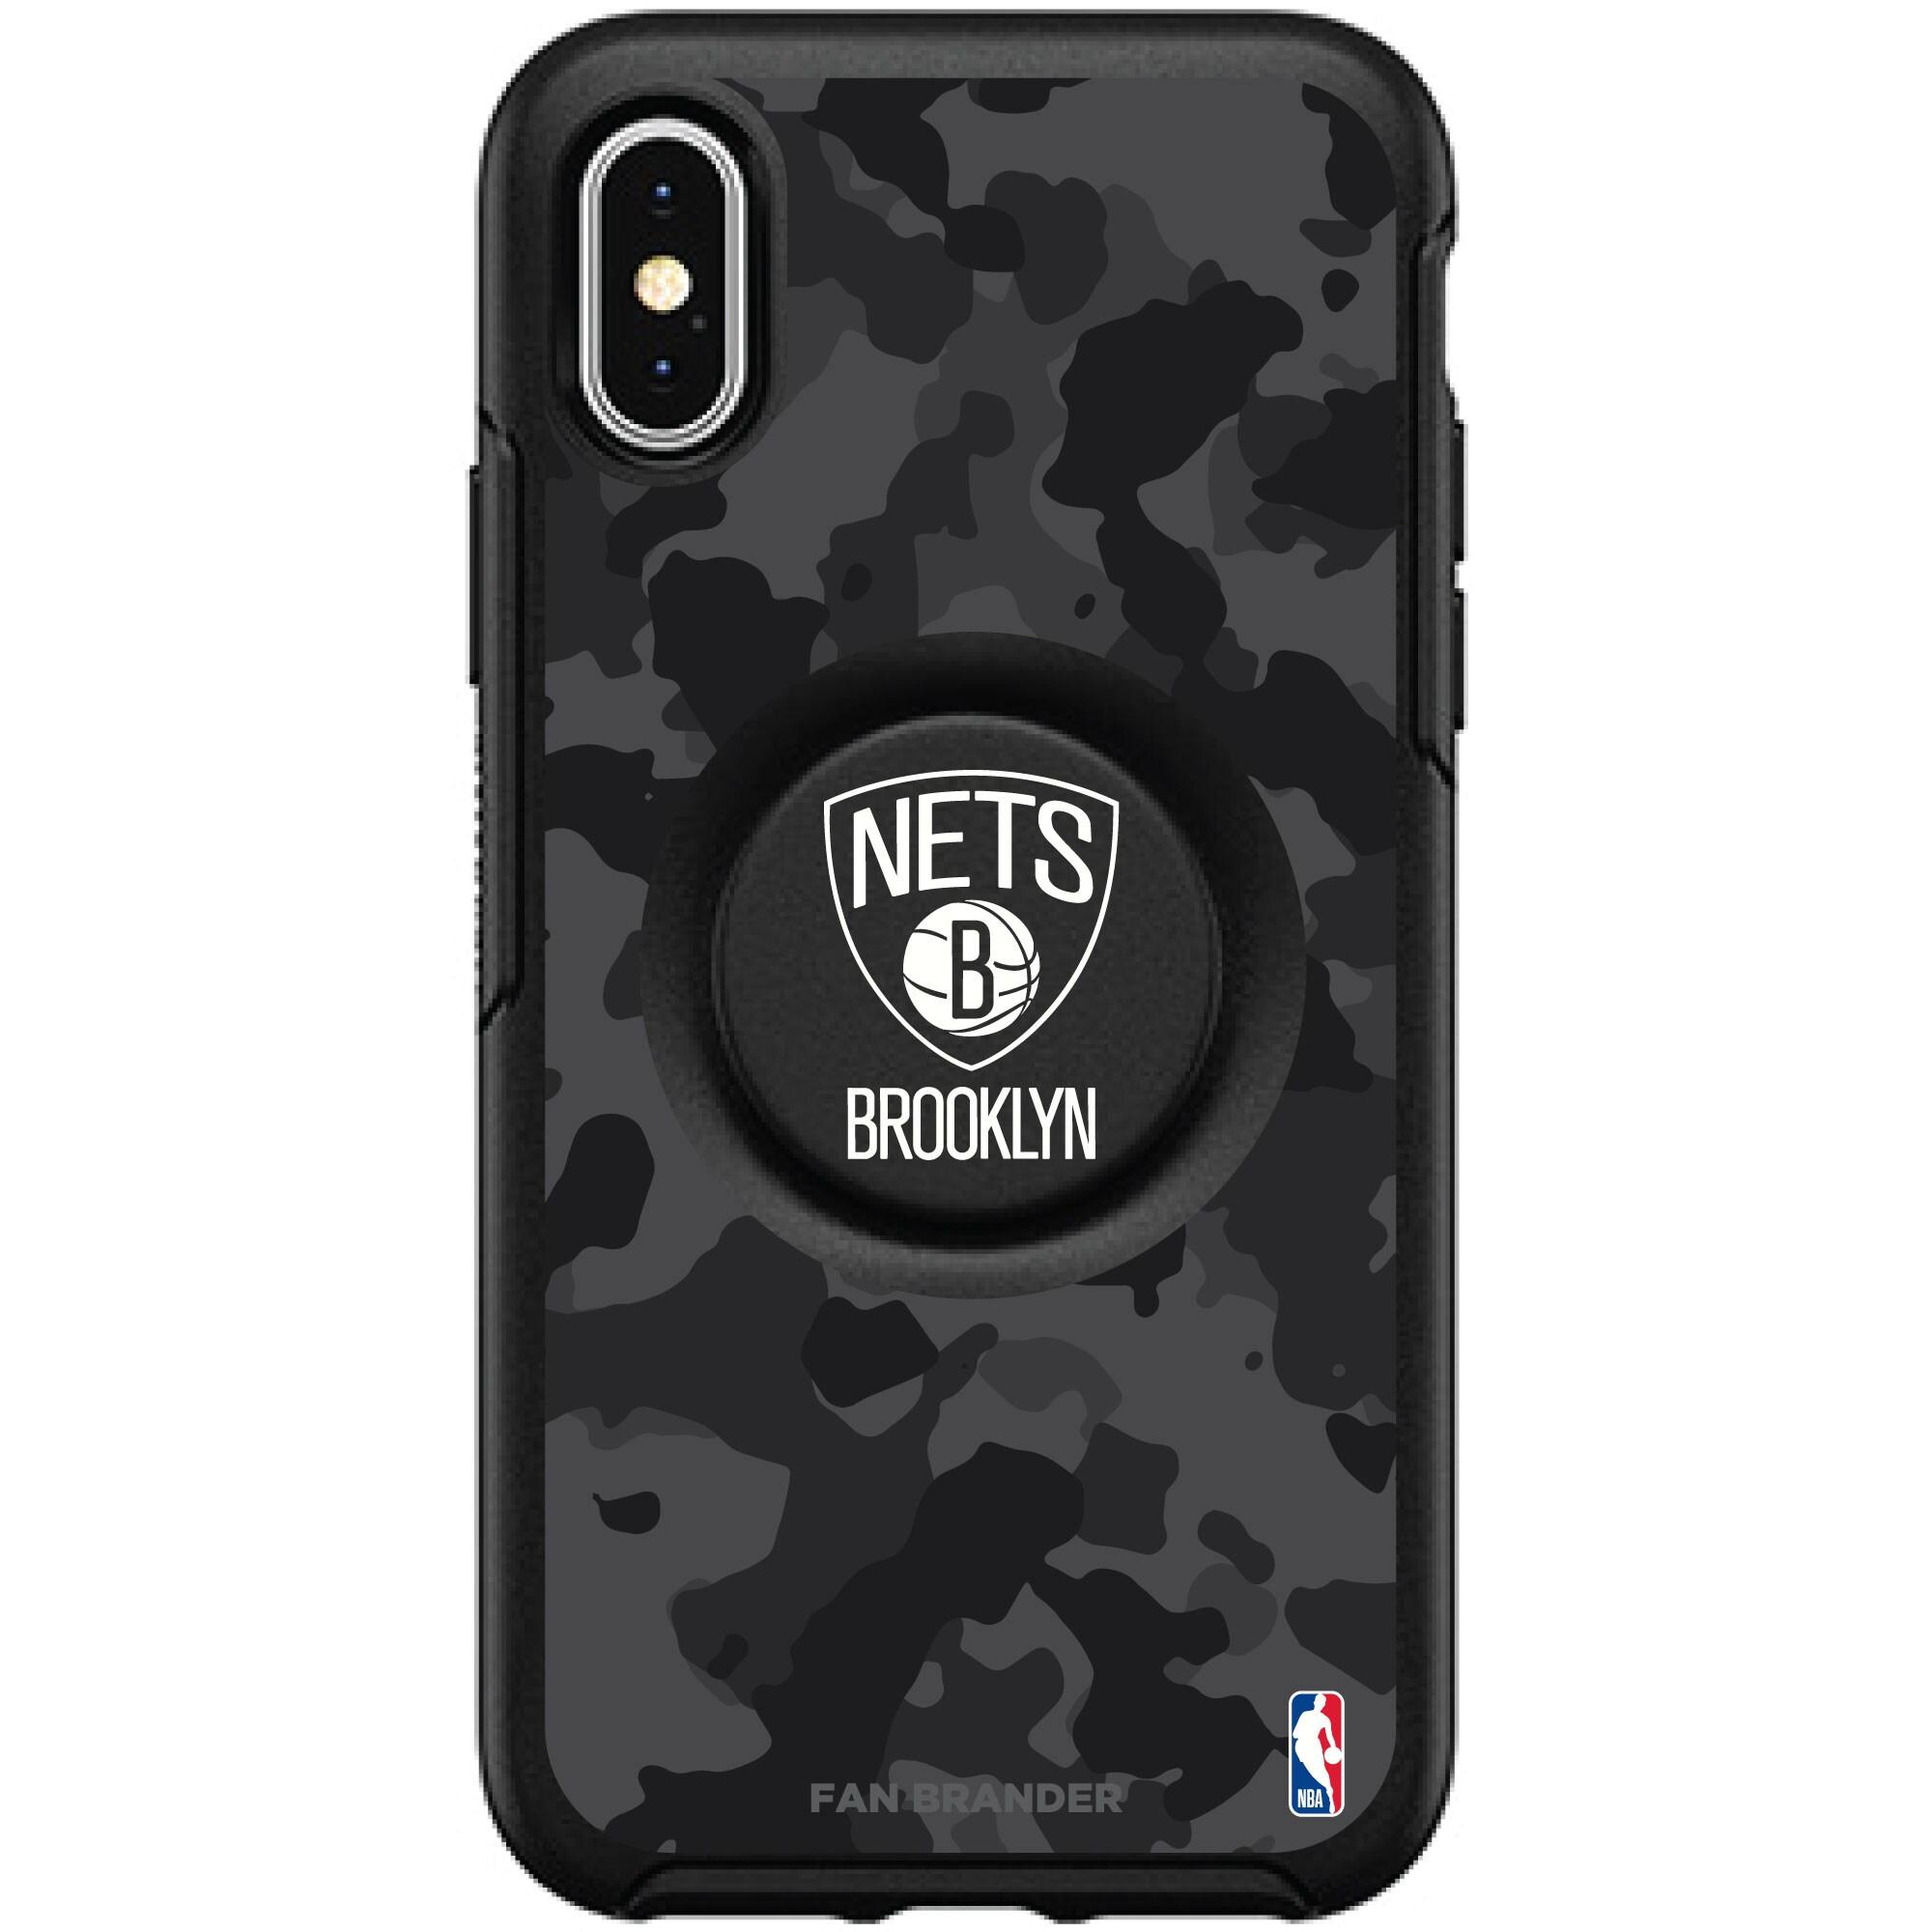 Brooklyn Nets OtterBox Otter + PopSocket Symmetry Urban Camo iPhone Case